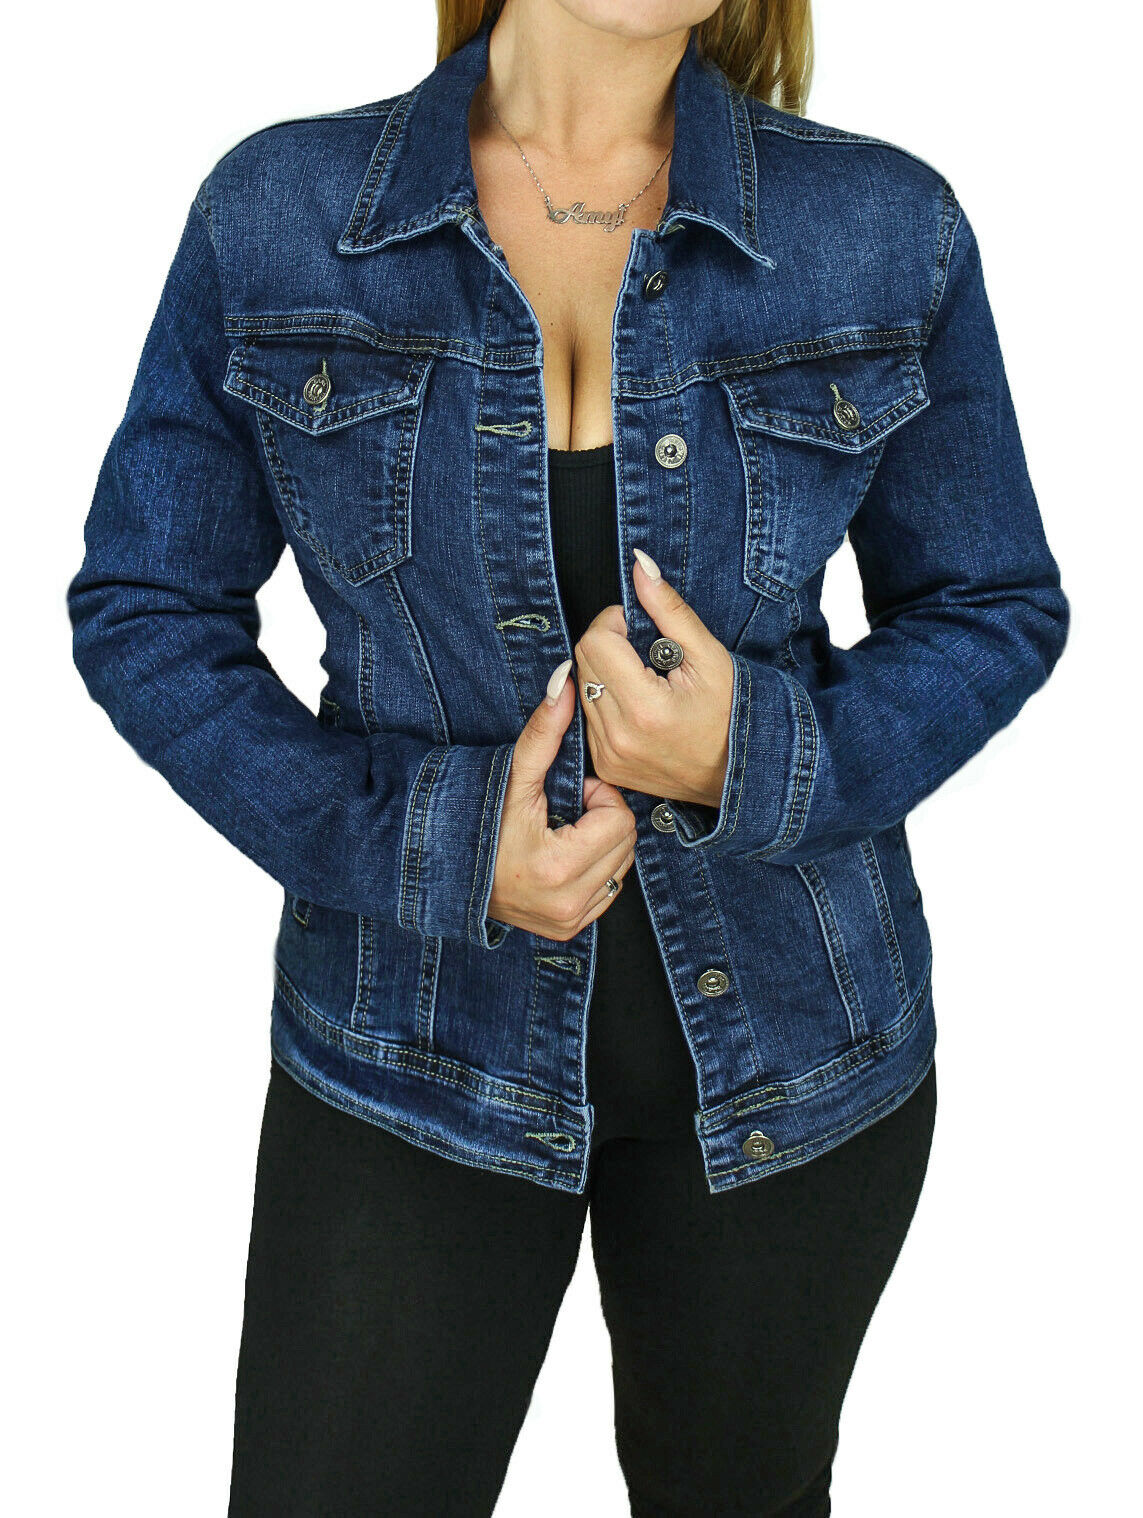 daa2bbfd16d7 Giacca giubbotto di jeans Diamond donna blu scuro Basic giubbino tessuto  denim